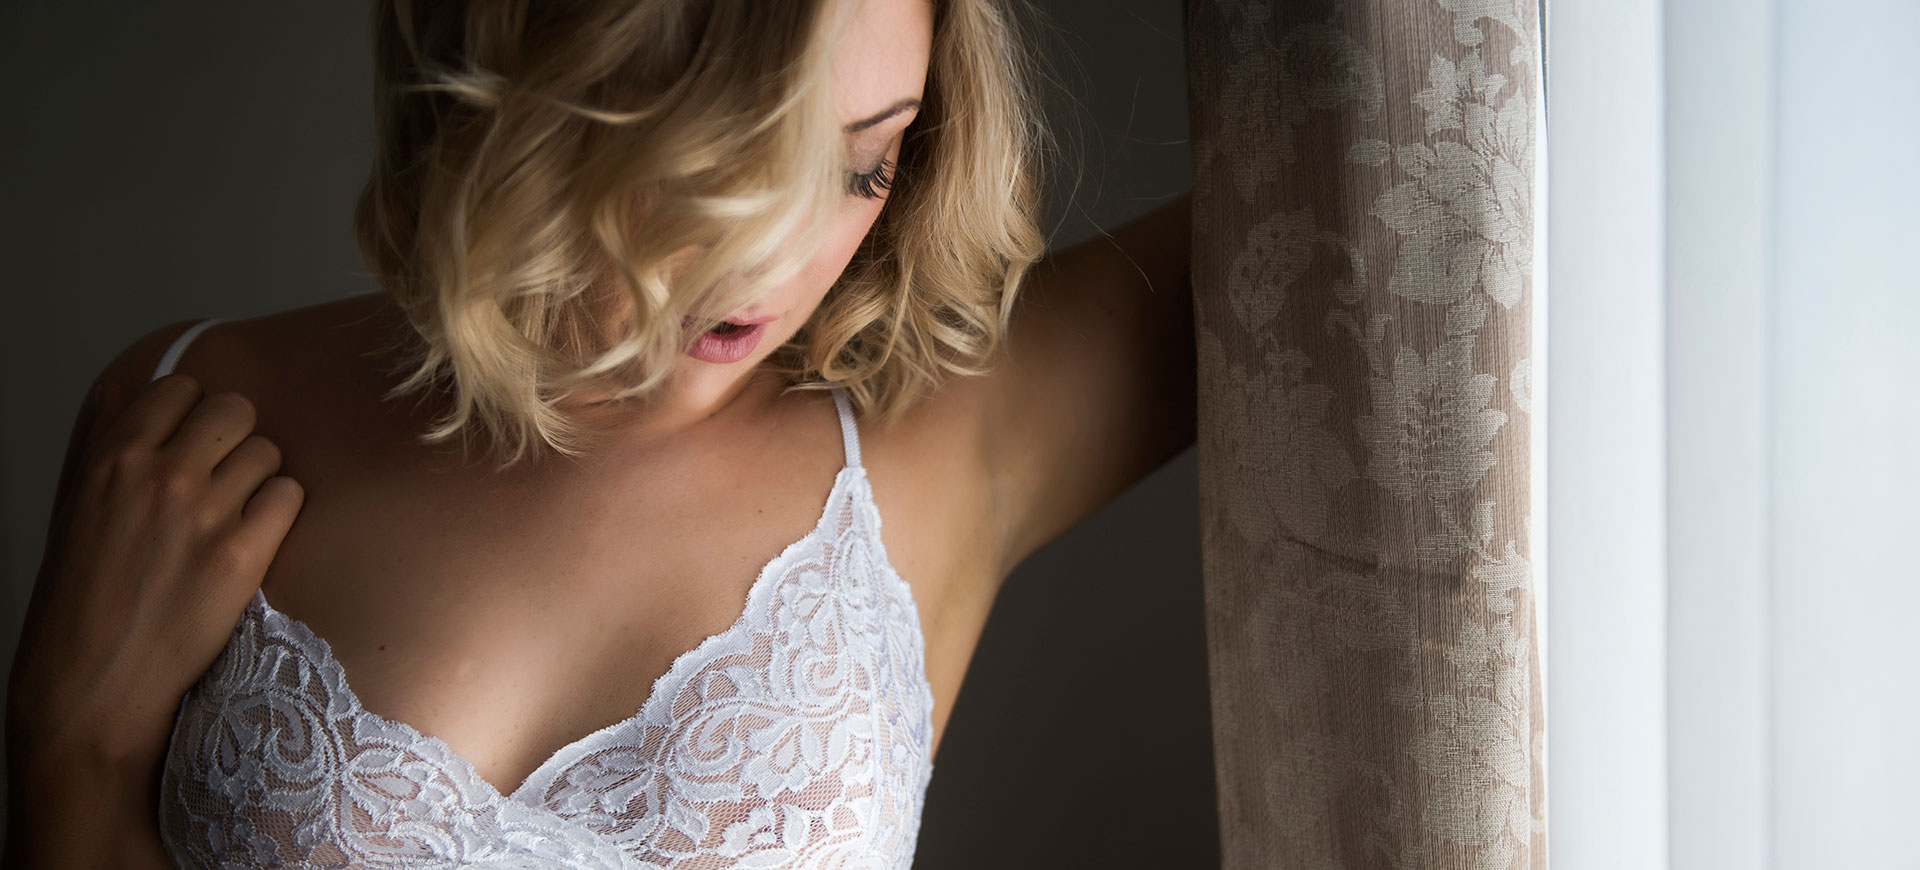 Bridal-boudoir-photography.jpg